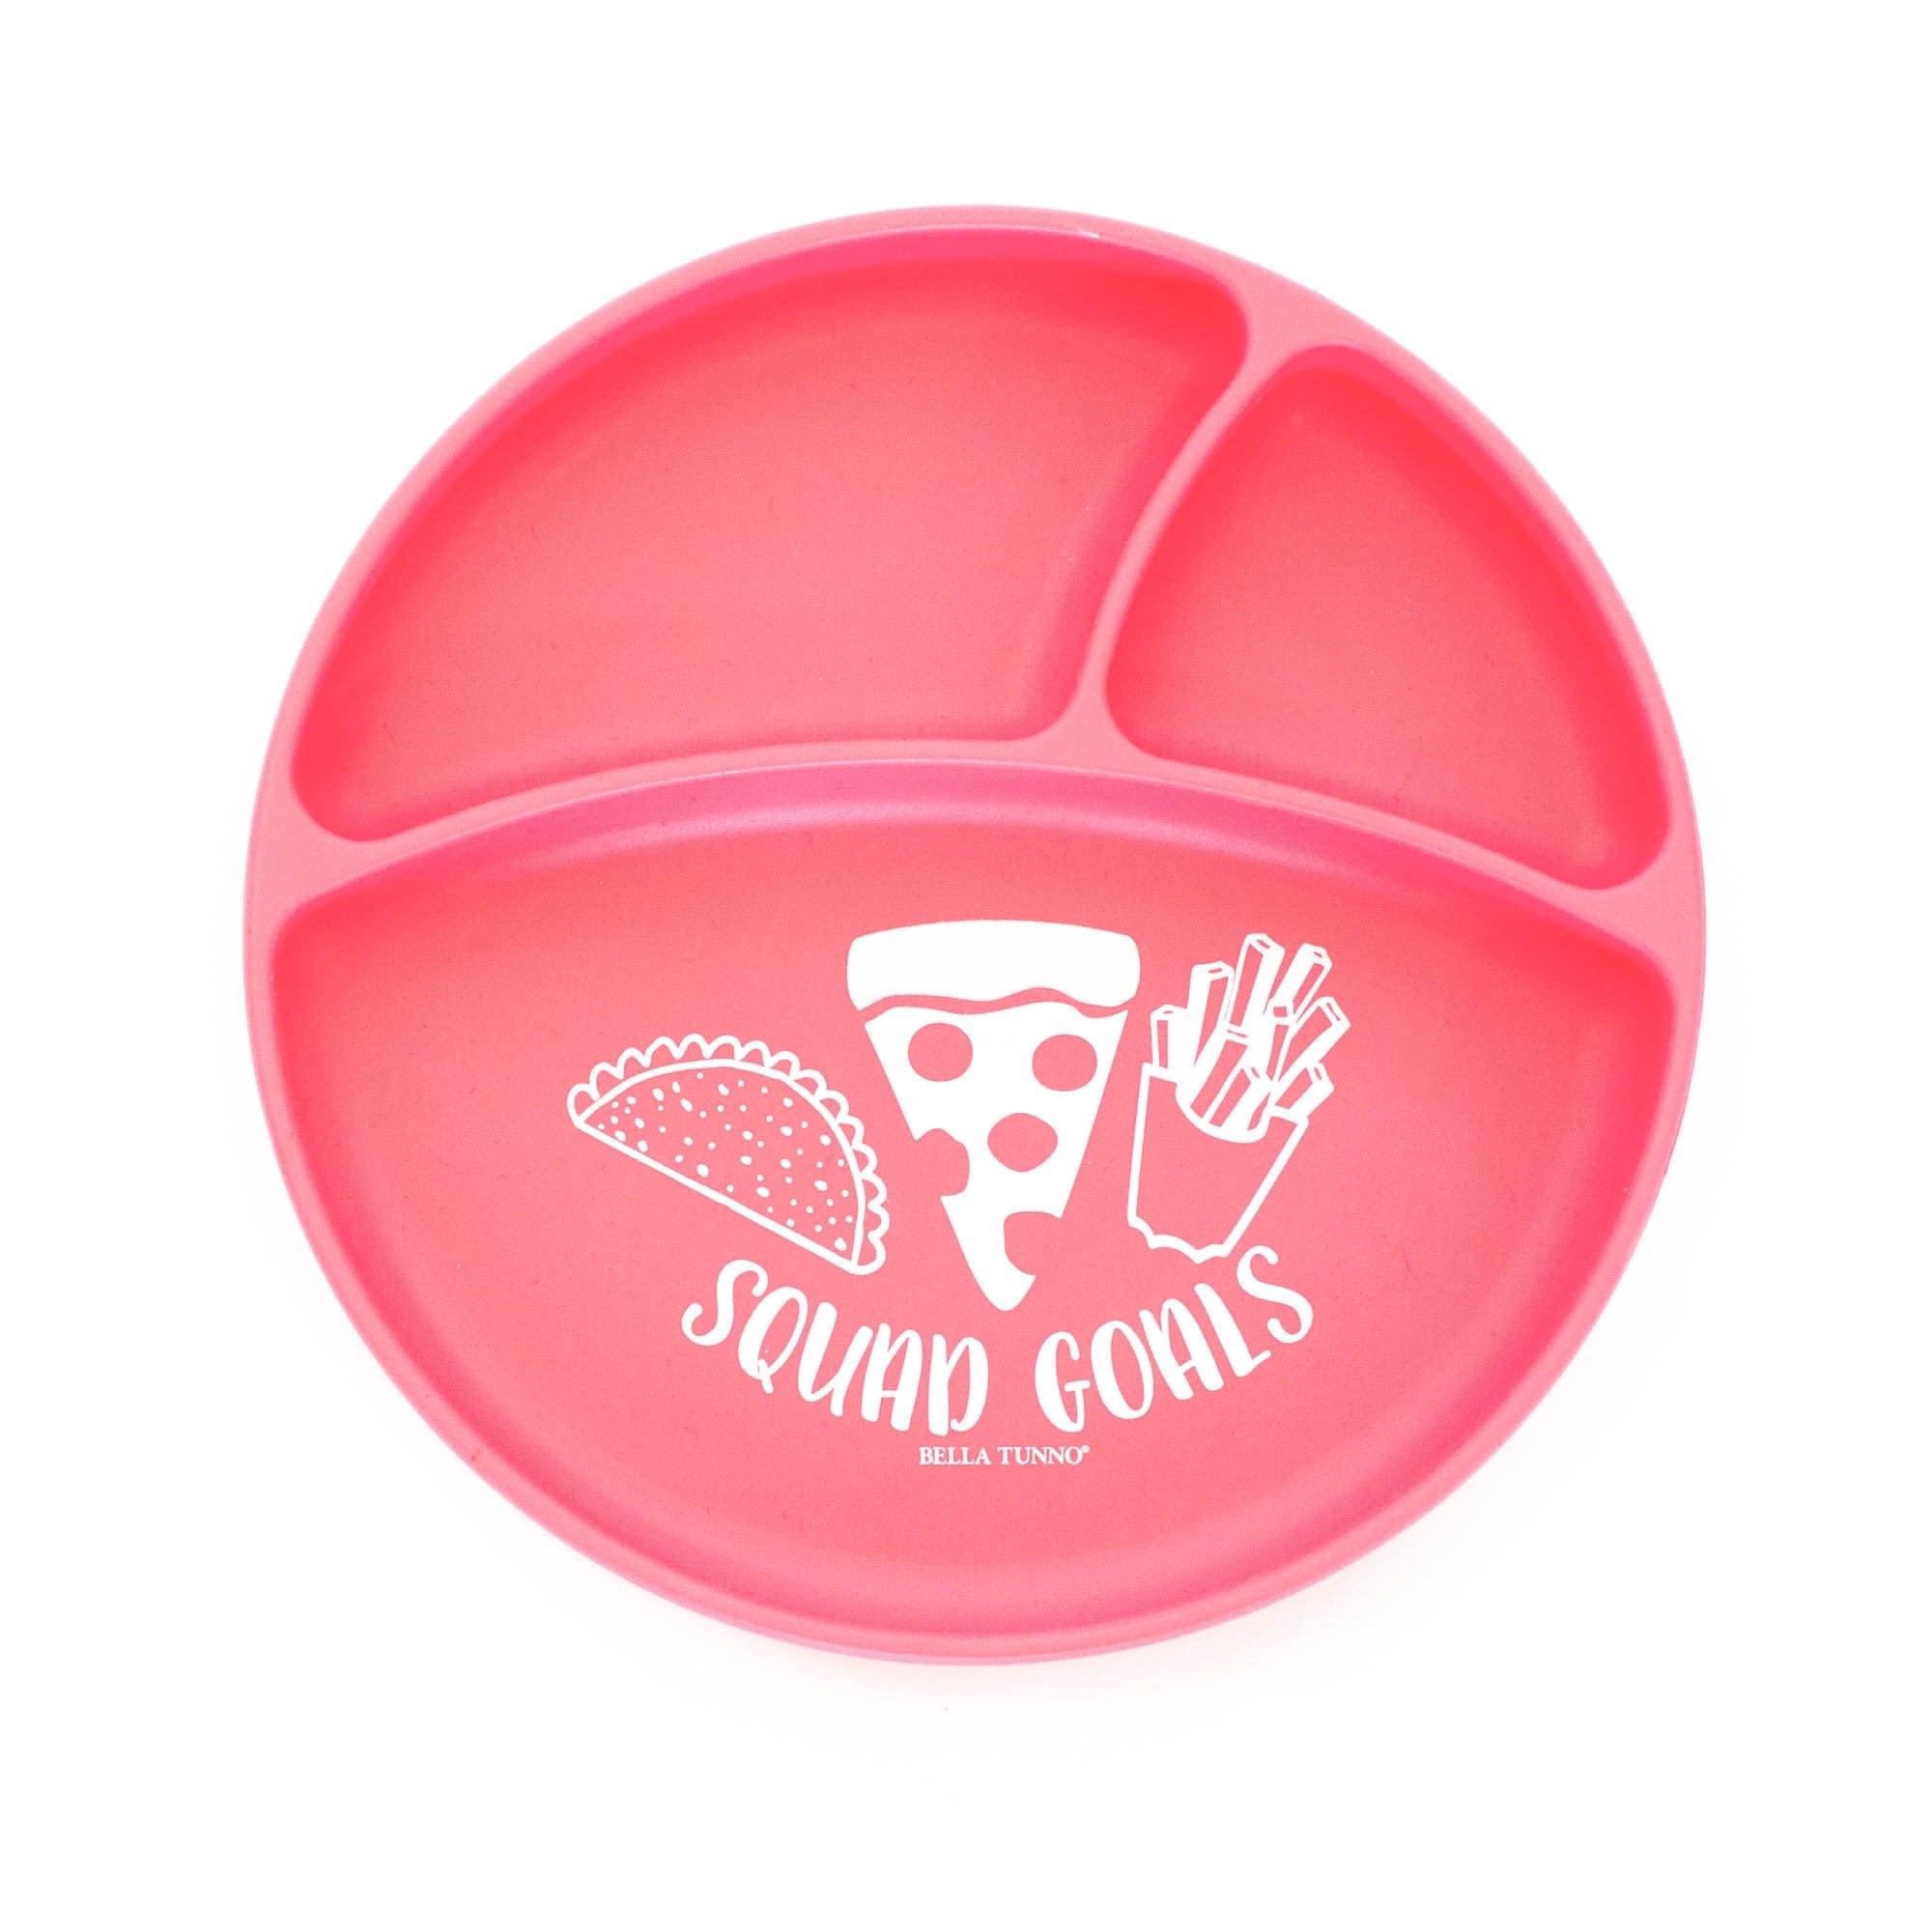 Bella Tunno Squad Goals Wonder Plate